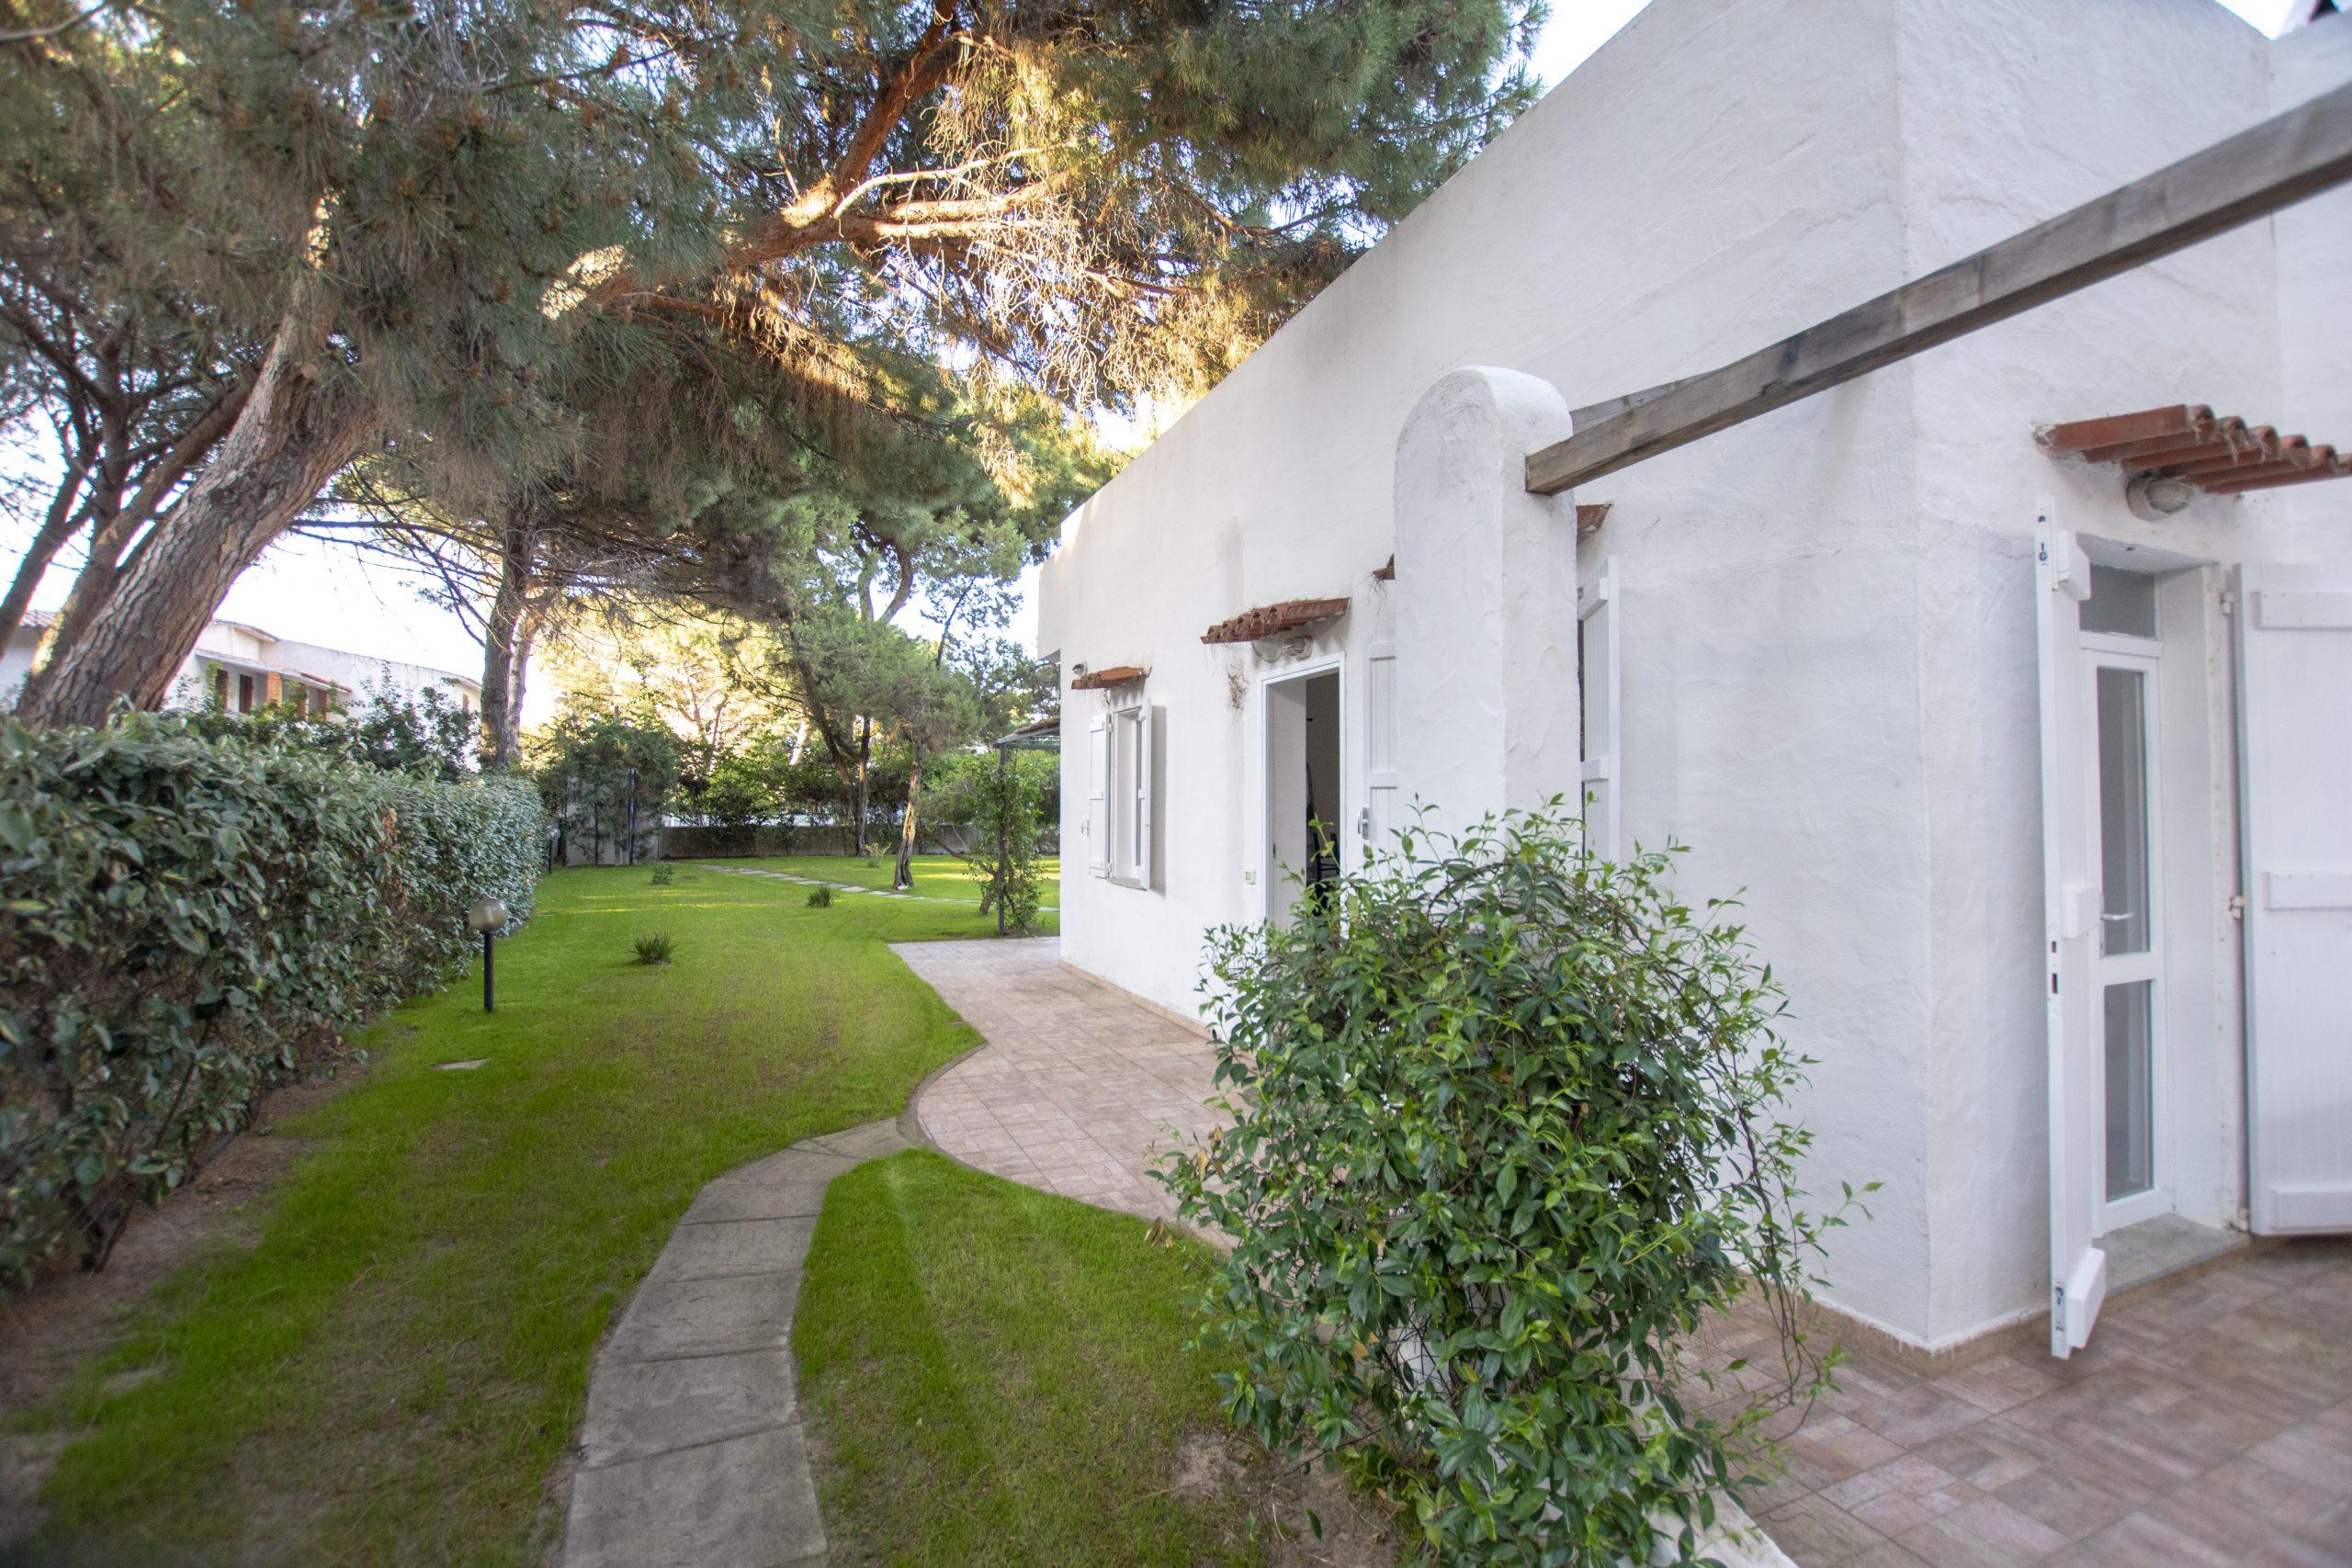 Villa Eucalipto, un'oasi di relax in Pineta San Pietro, Valledoria